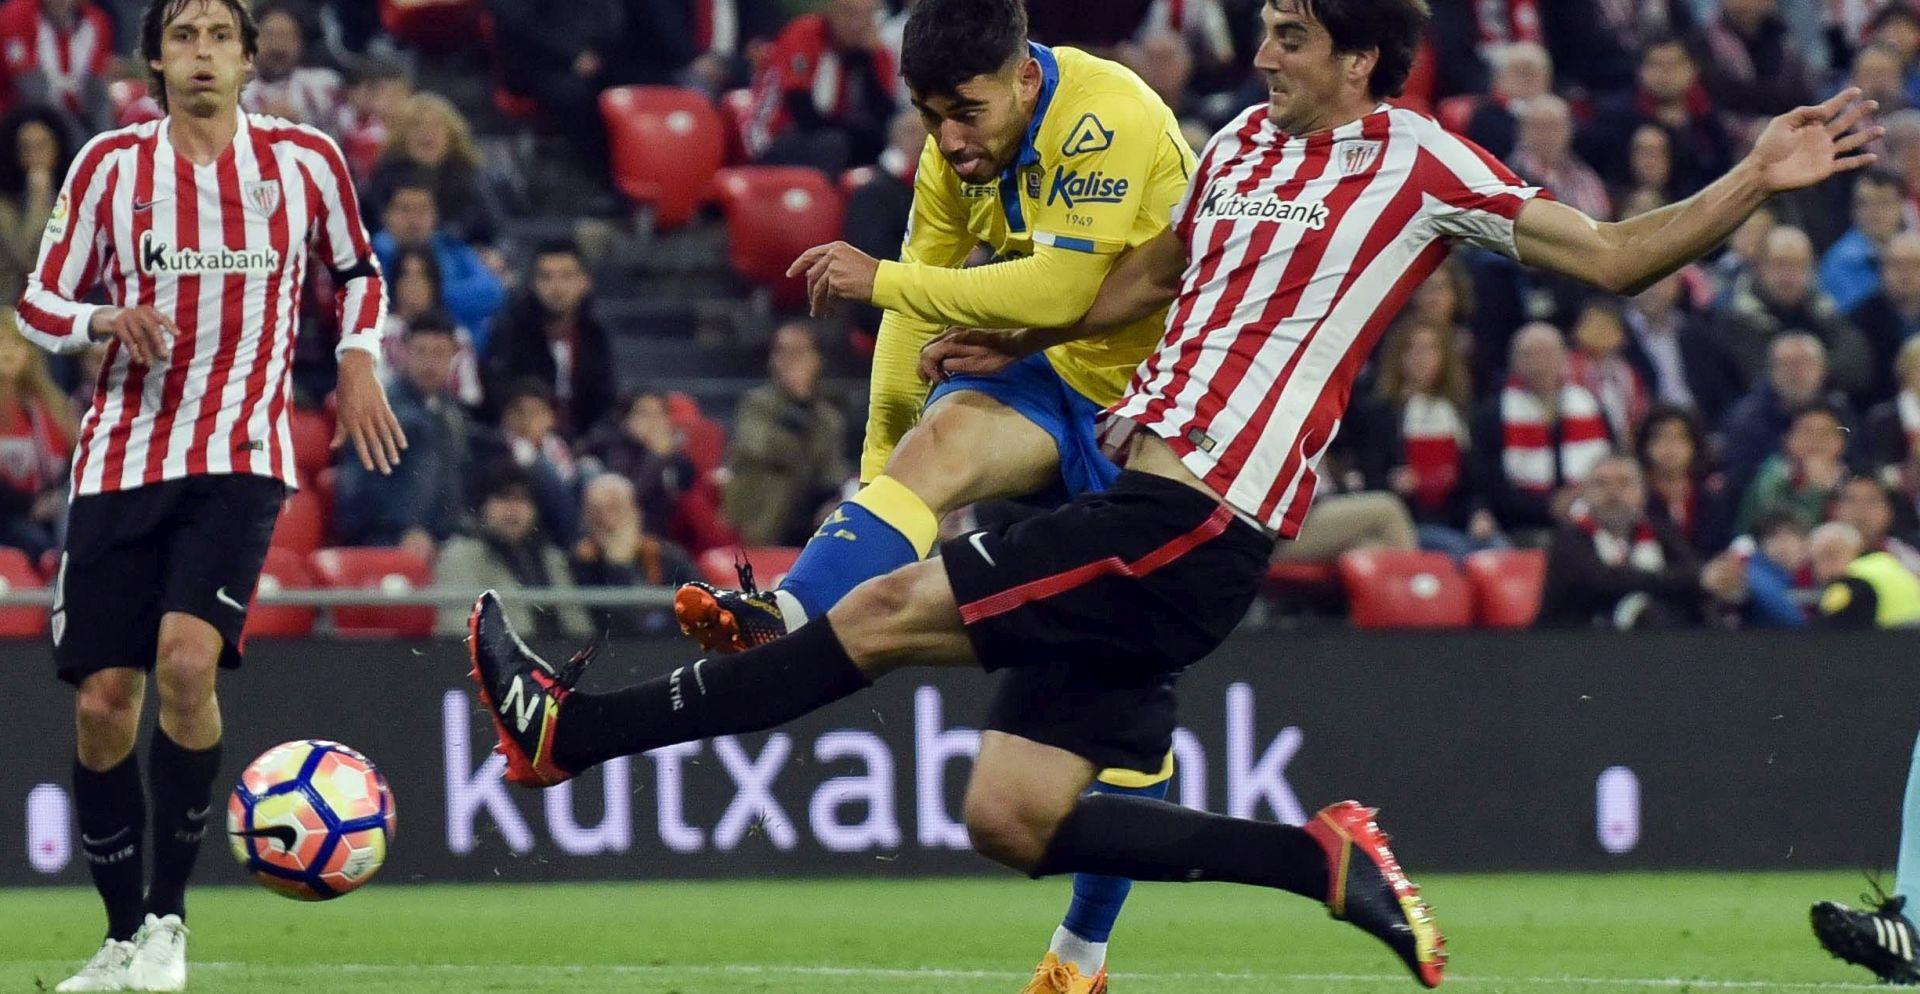 Athletic Bilbao – Las Palmas 5-1